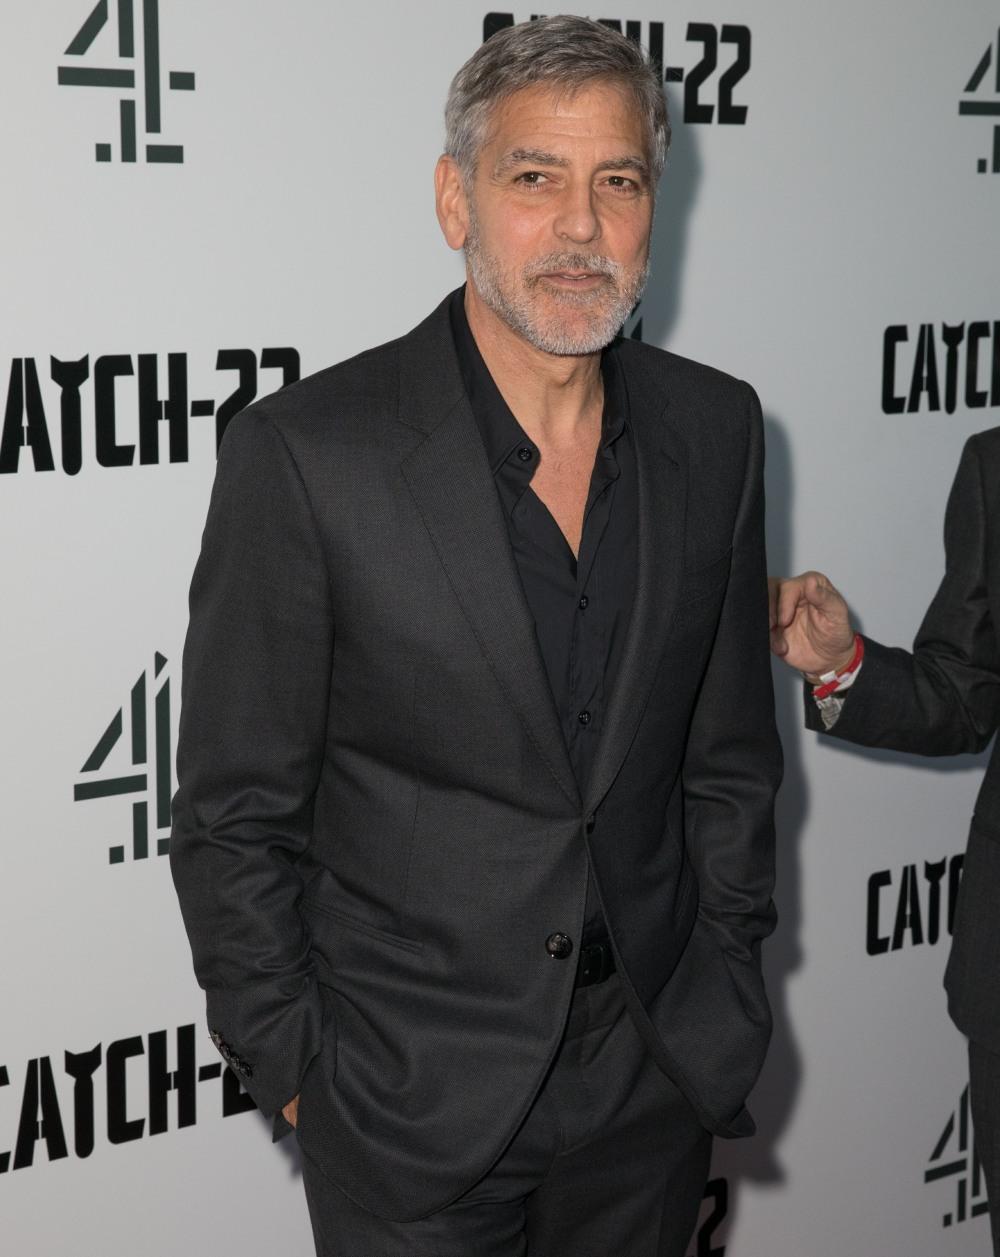 Catch-22 TV Premiere